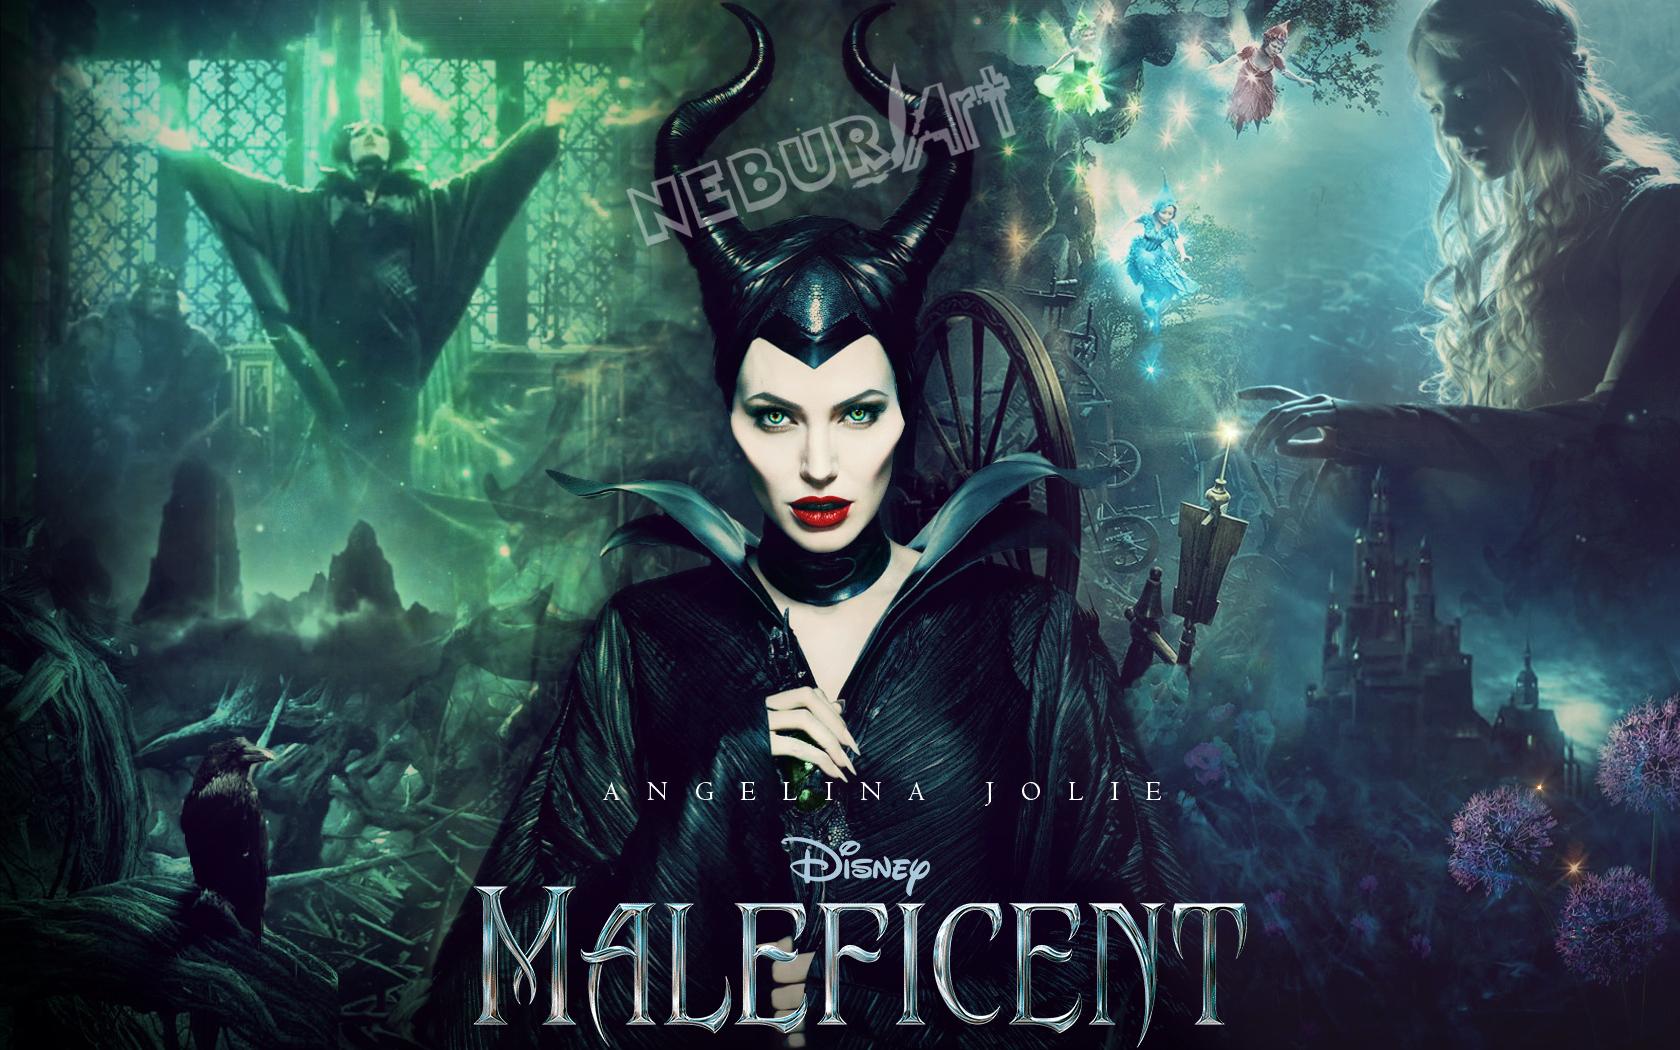 Maleficent Wallpaper English by NeburArt on DeviantArt